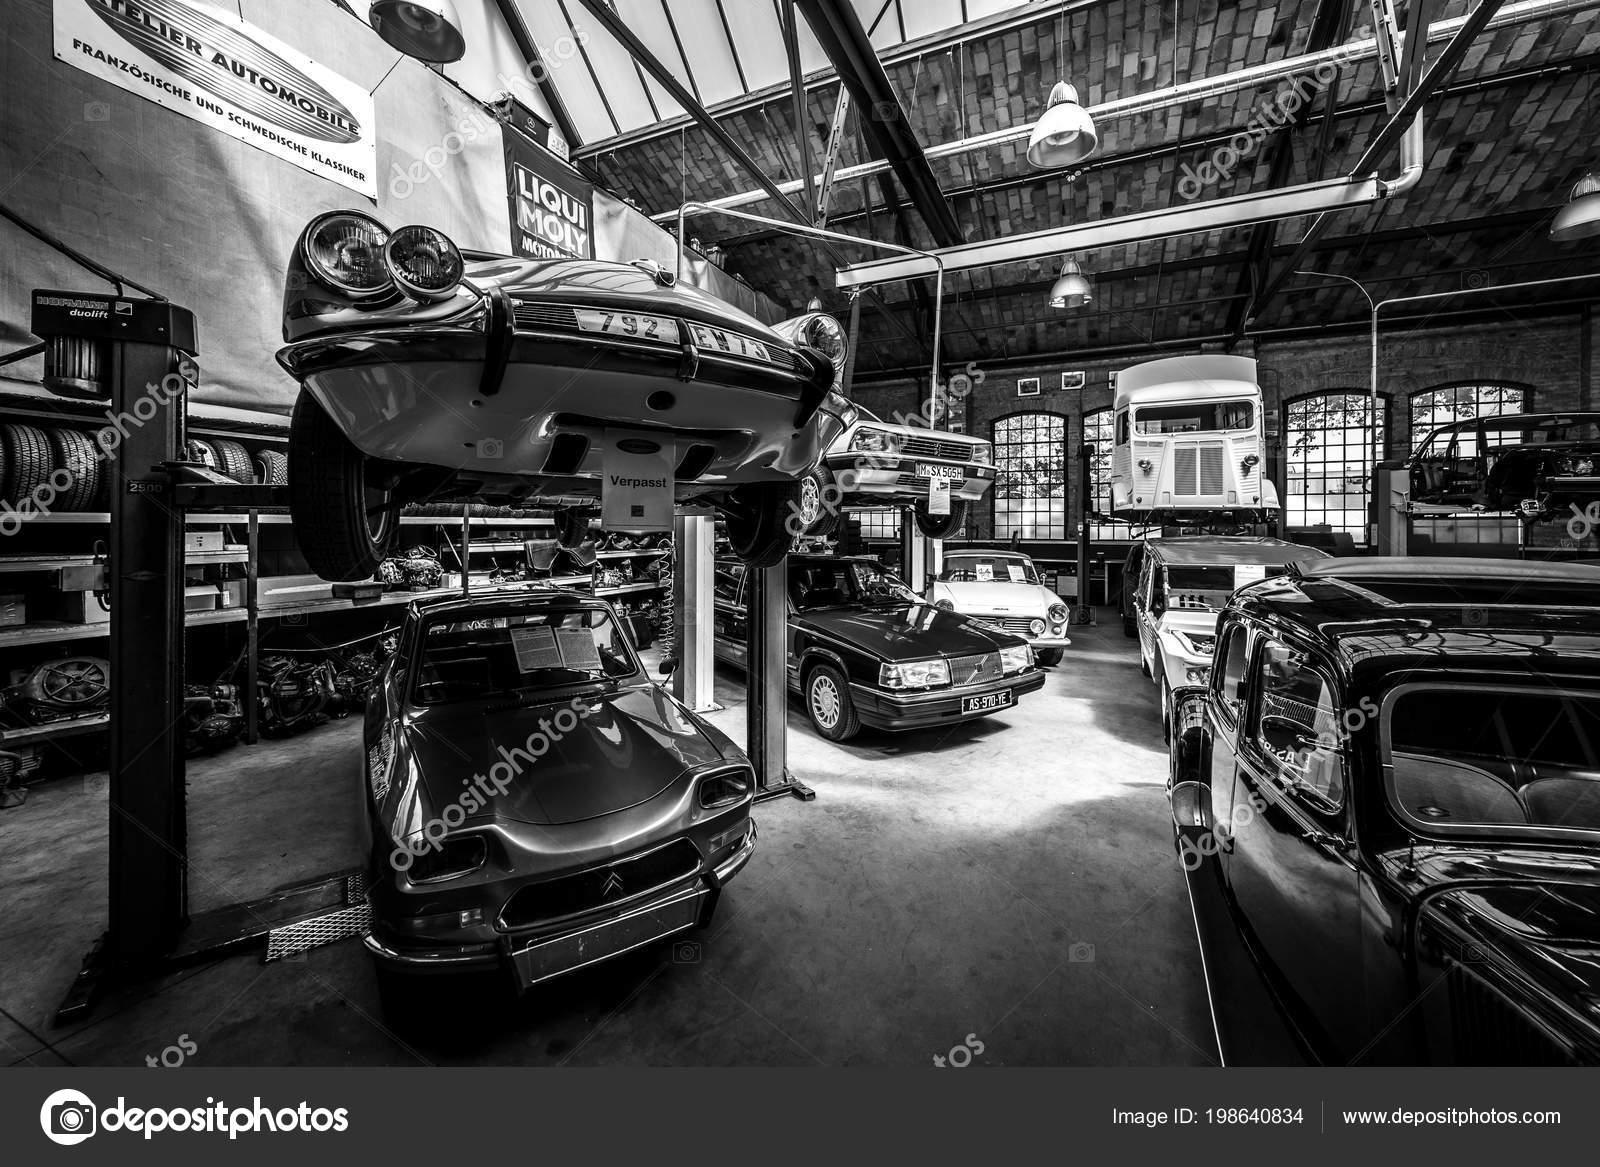 Berlin May 2018 Workshop Maintenance Repair Retro Cars Complex Buildings Stock Editorial Photo C S Kohl 198640834